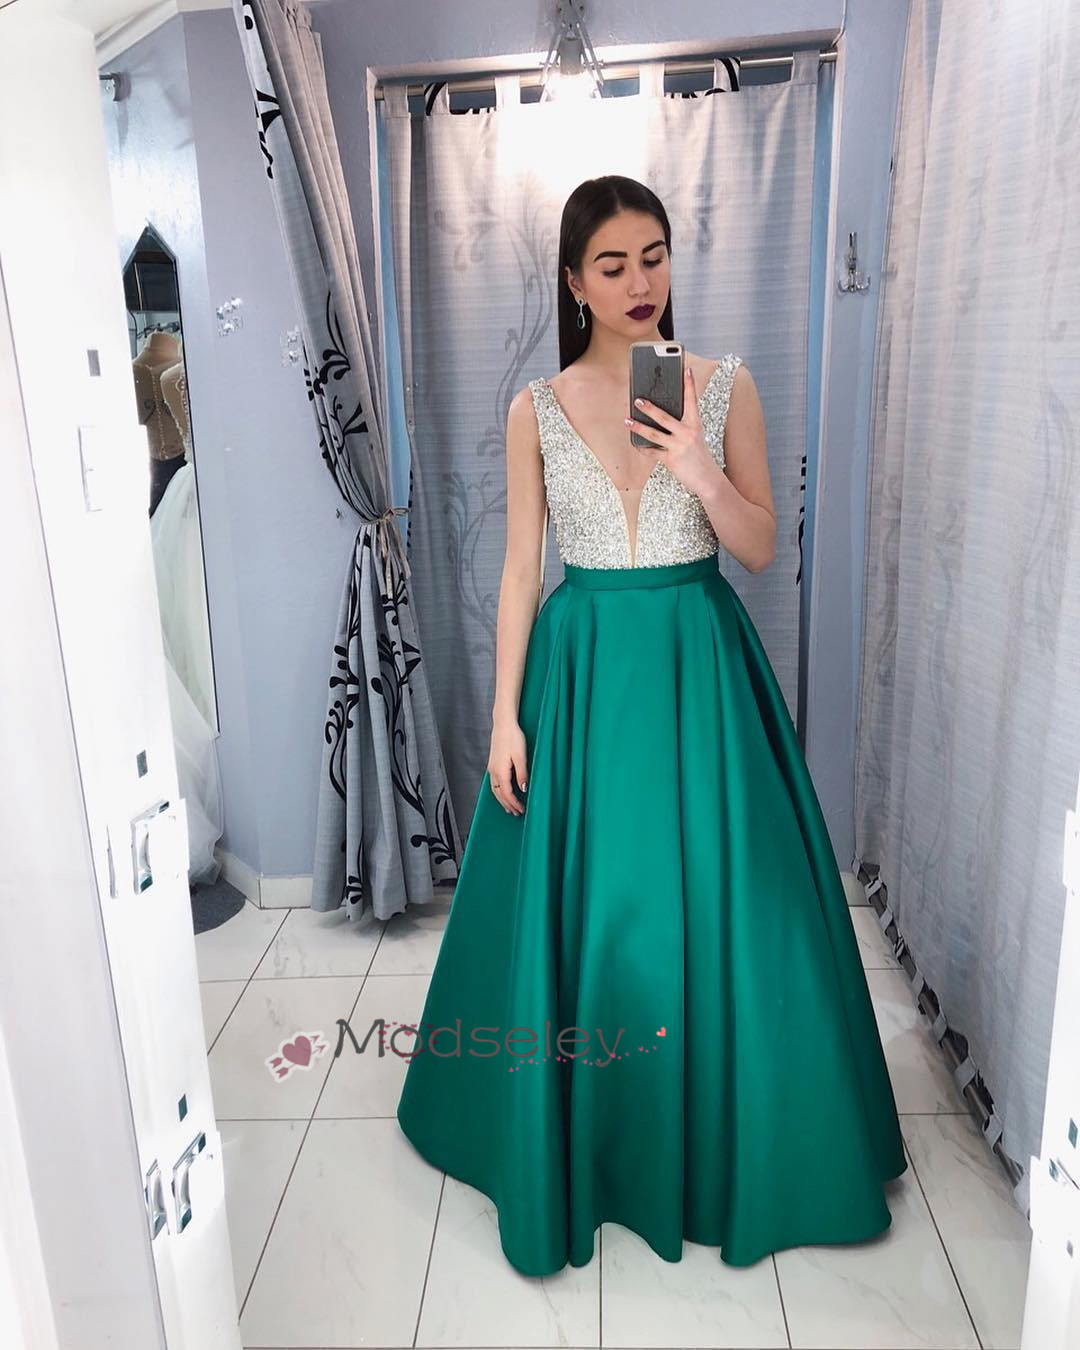 c09c974cee2 Elegant Emerald Green Long Prom Dress · modseleystore · Online Store ...